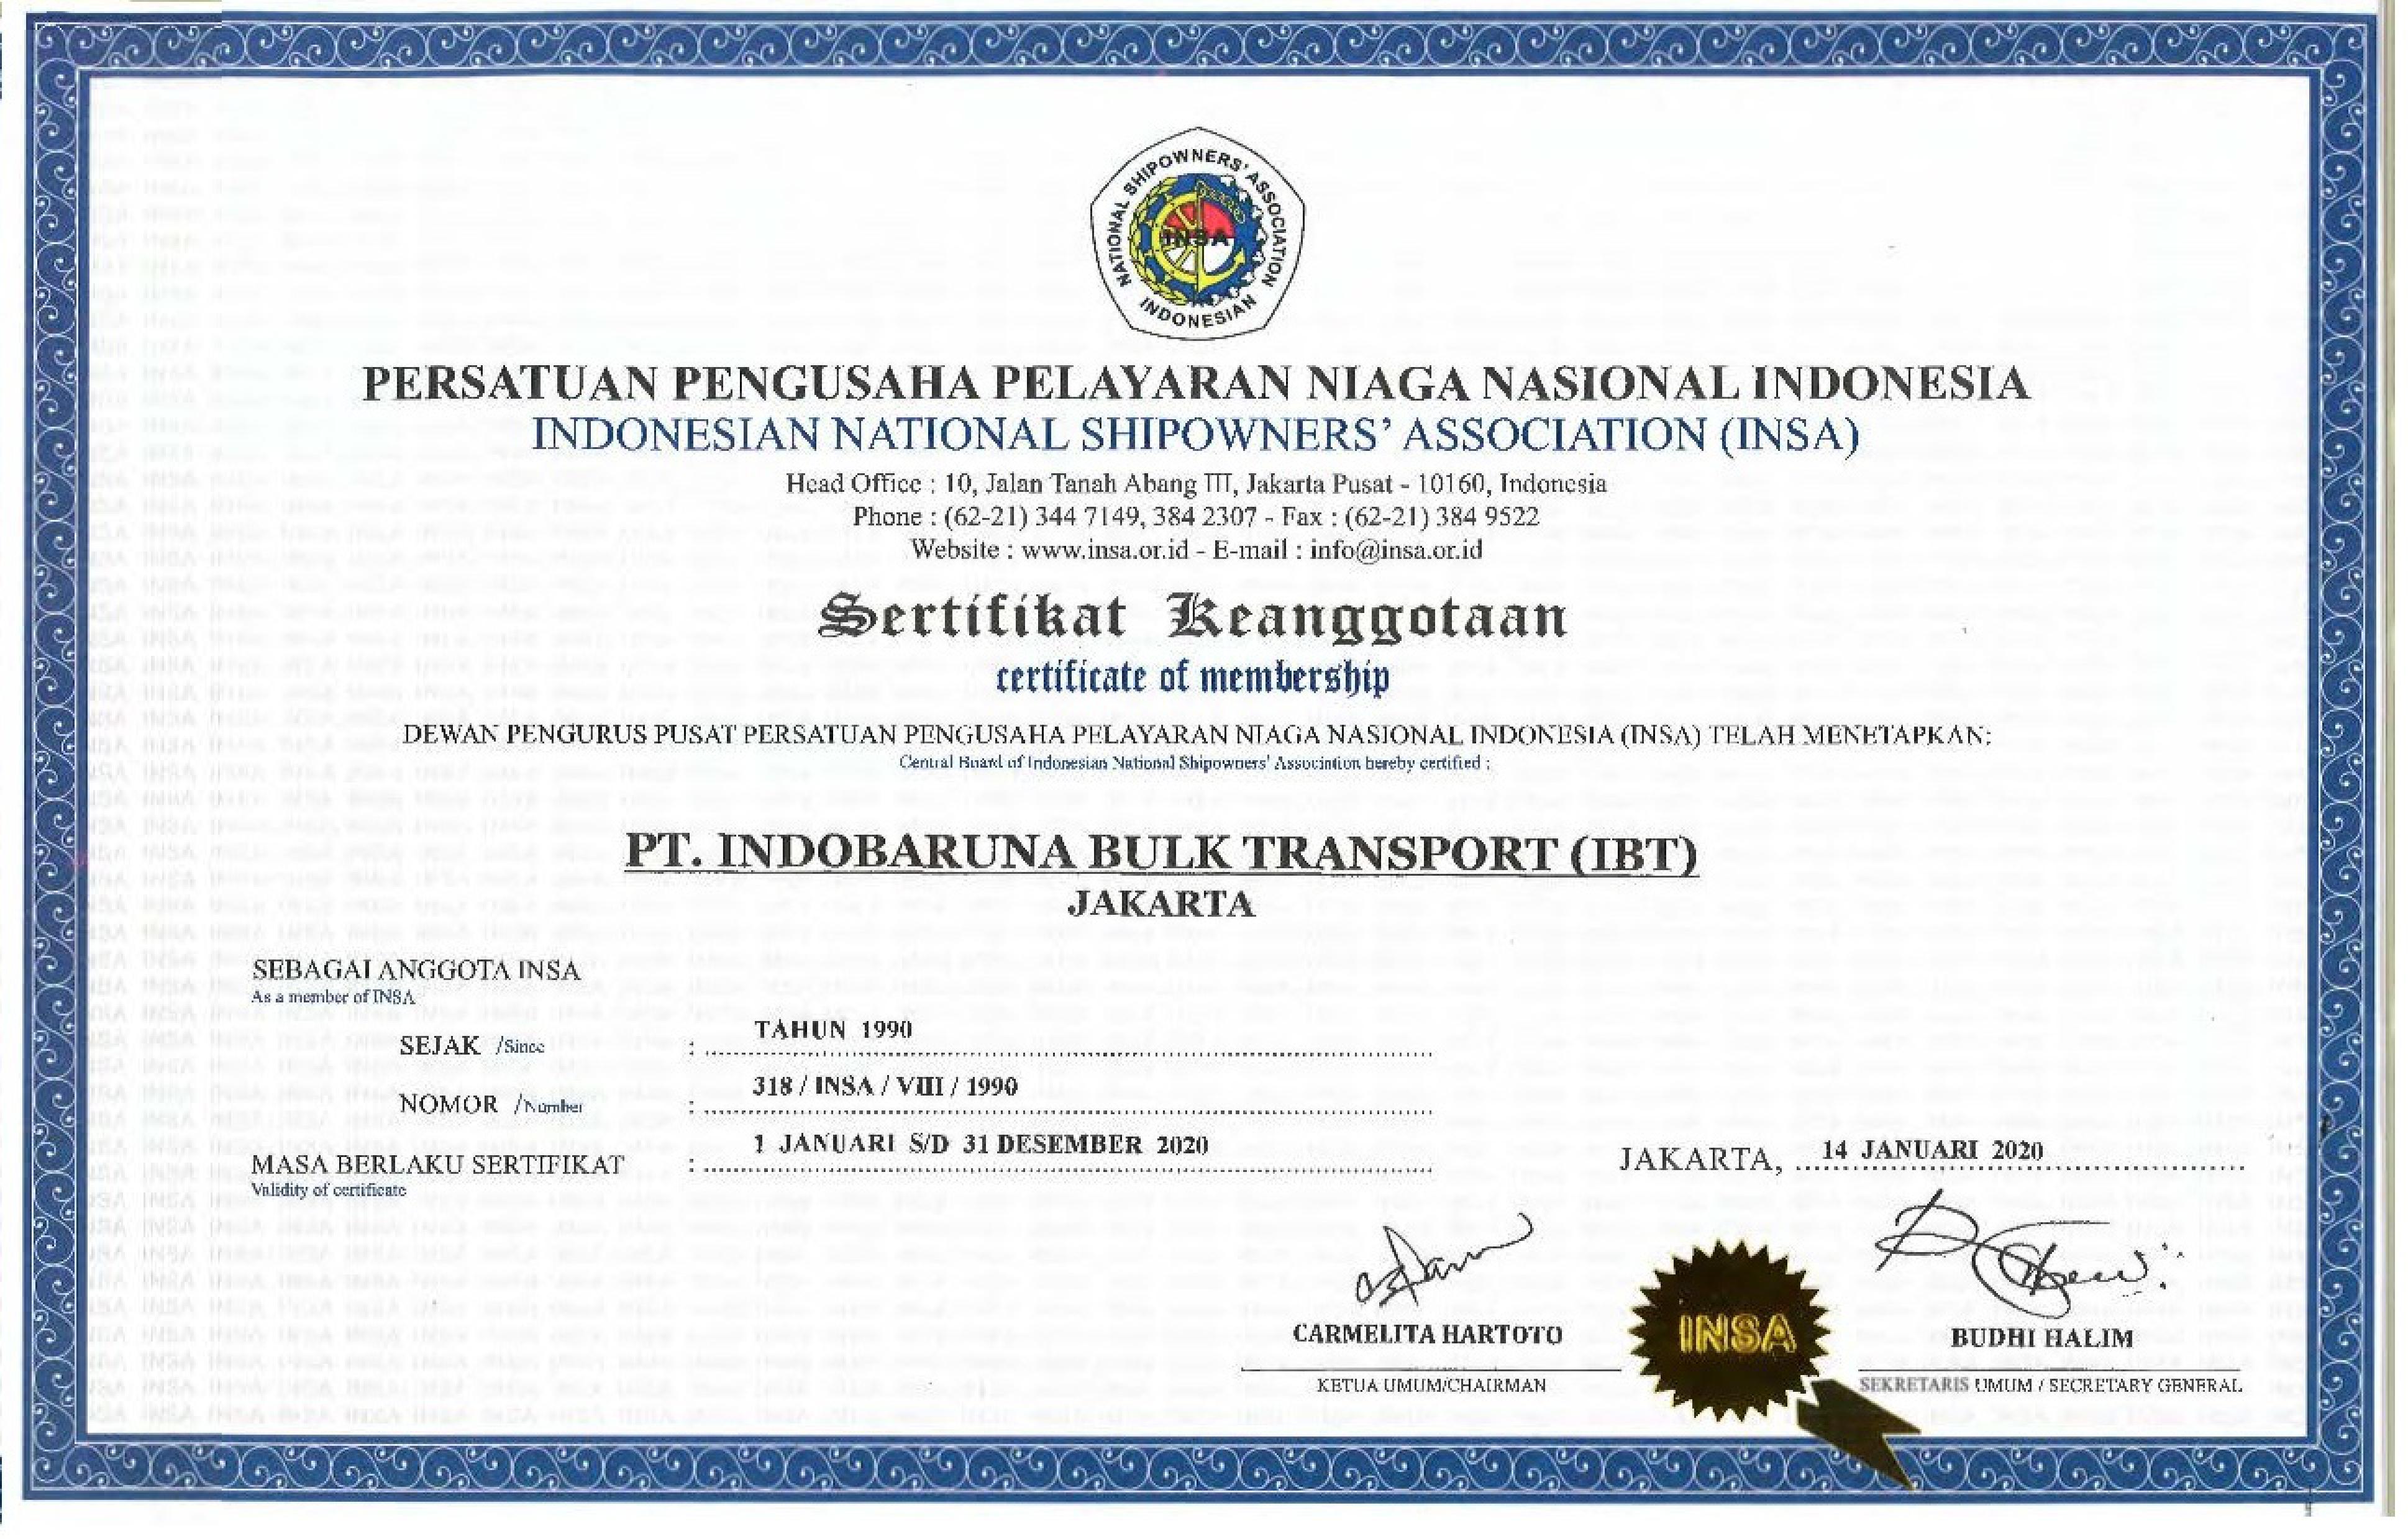 Image Certificate